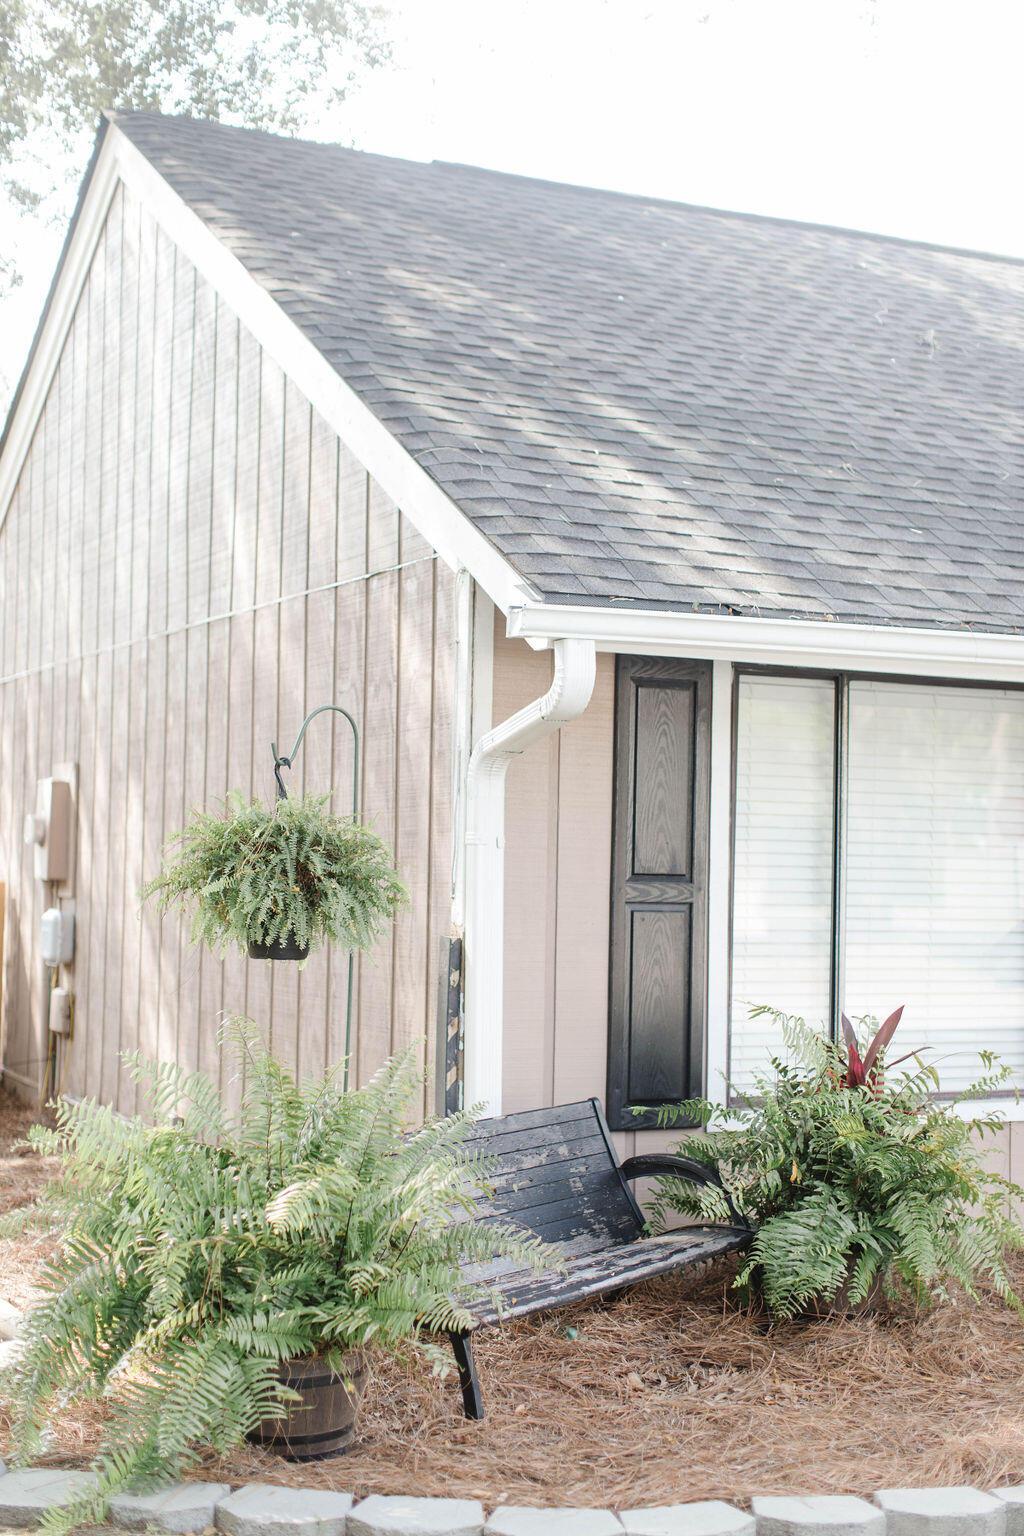 Snee Farm Homes For Sale - 1136 Honeysuckle, Mount Pleasant, SC - 38